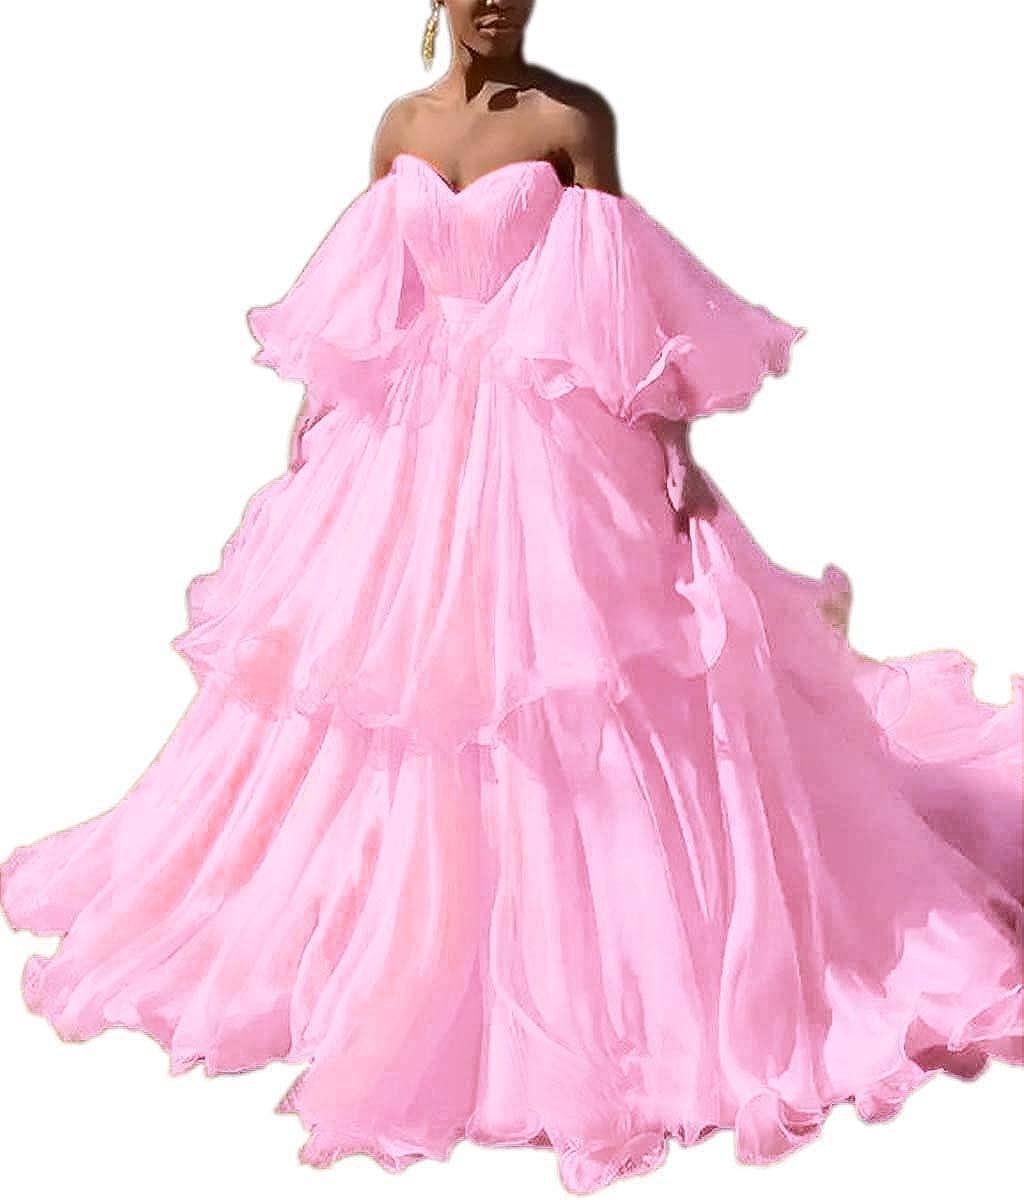 Pink Mauwey Women's Sweetheart Bell Sleeve Long Ruffles Organza Formal Prom Dresses Wedding Dress Evening Party Gown